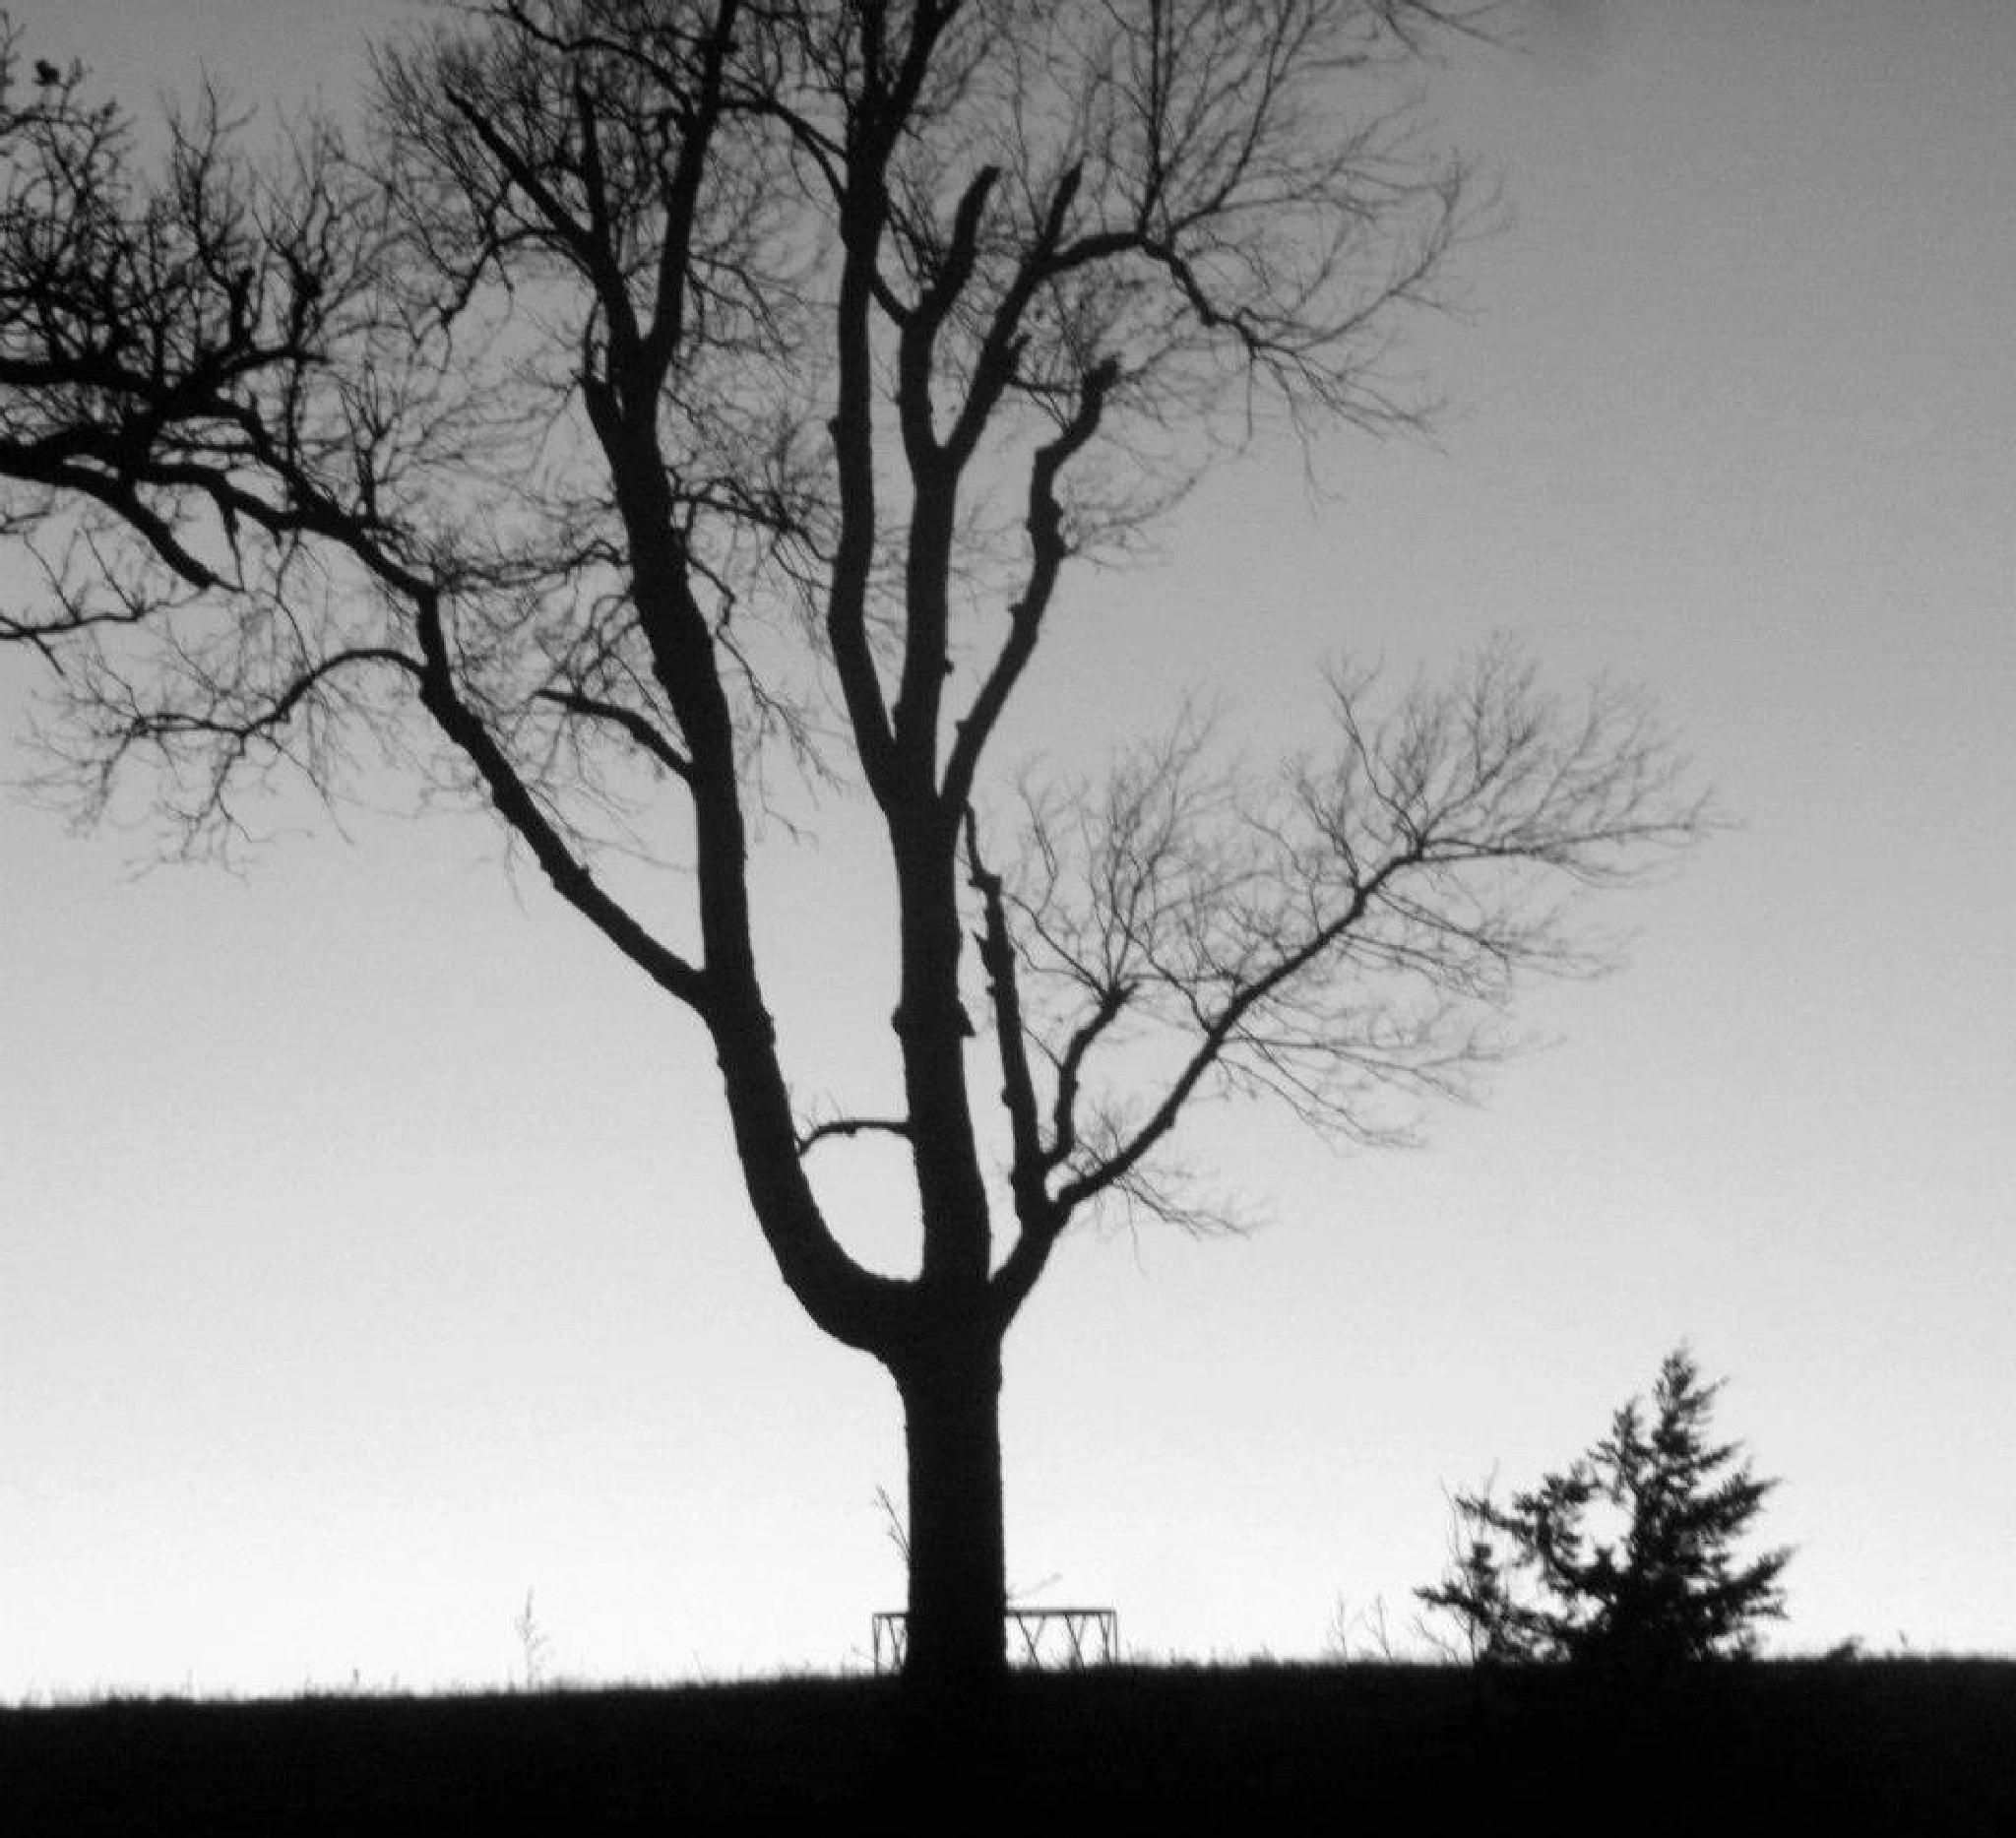 Tree by Marsha Furman